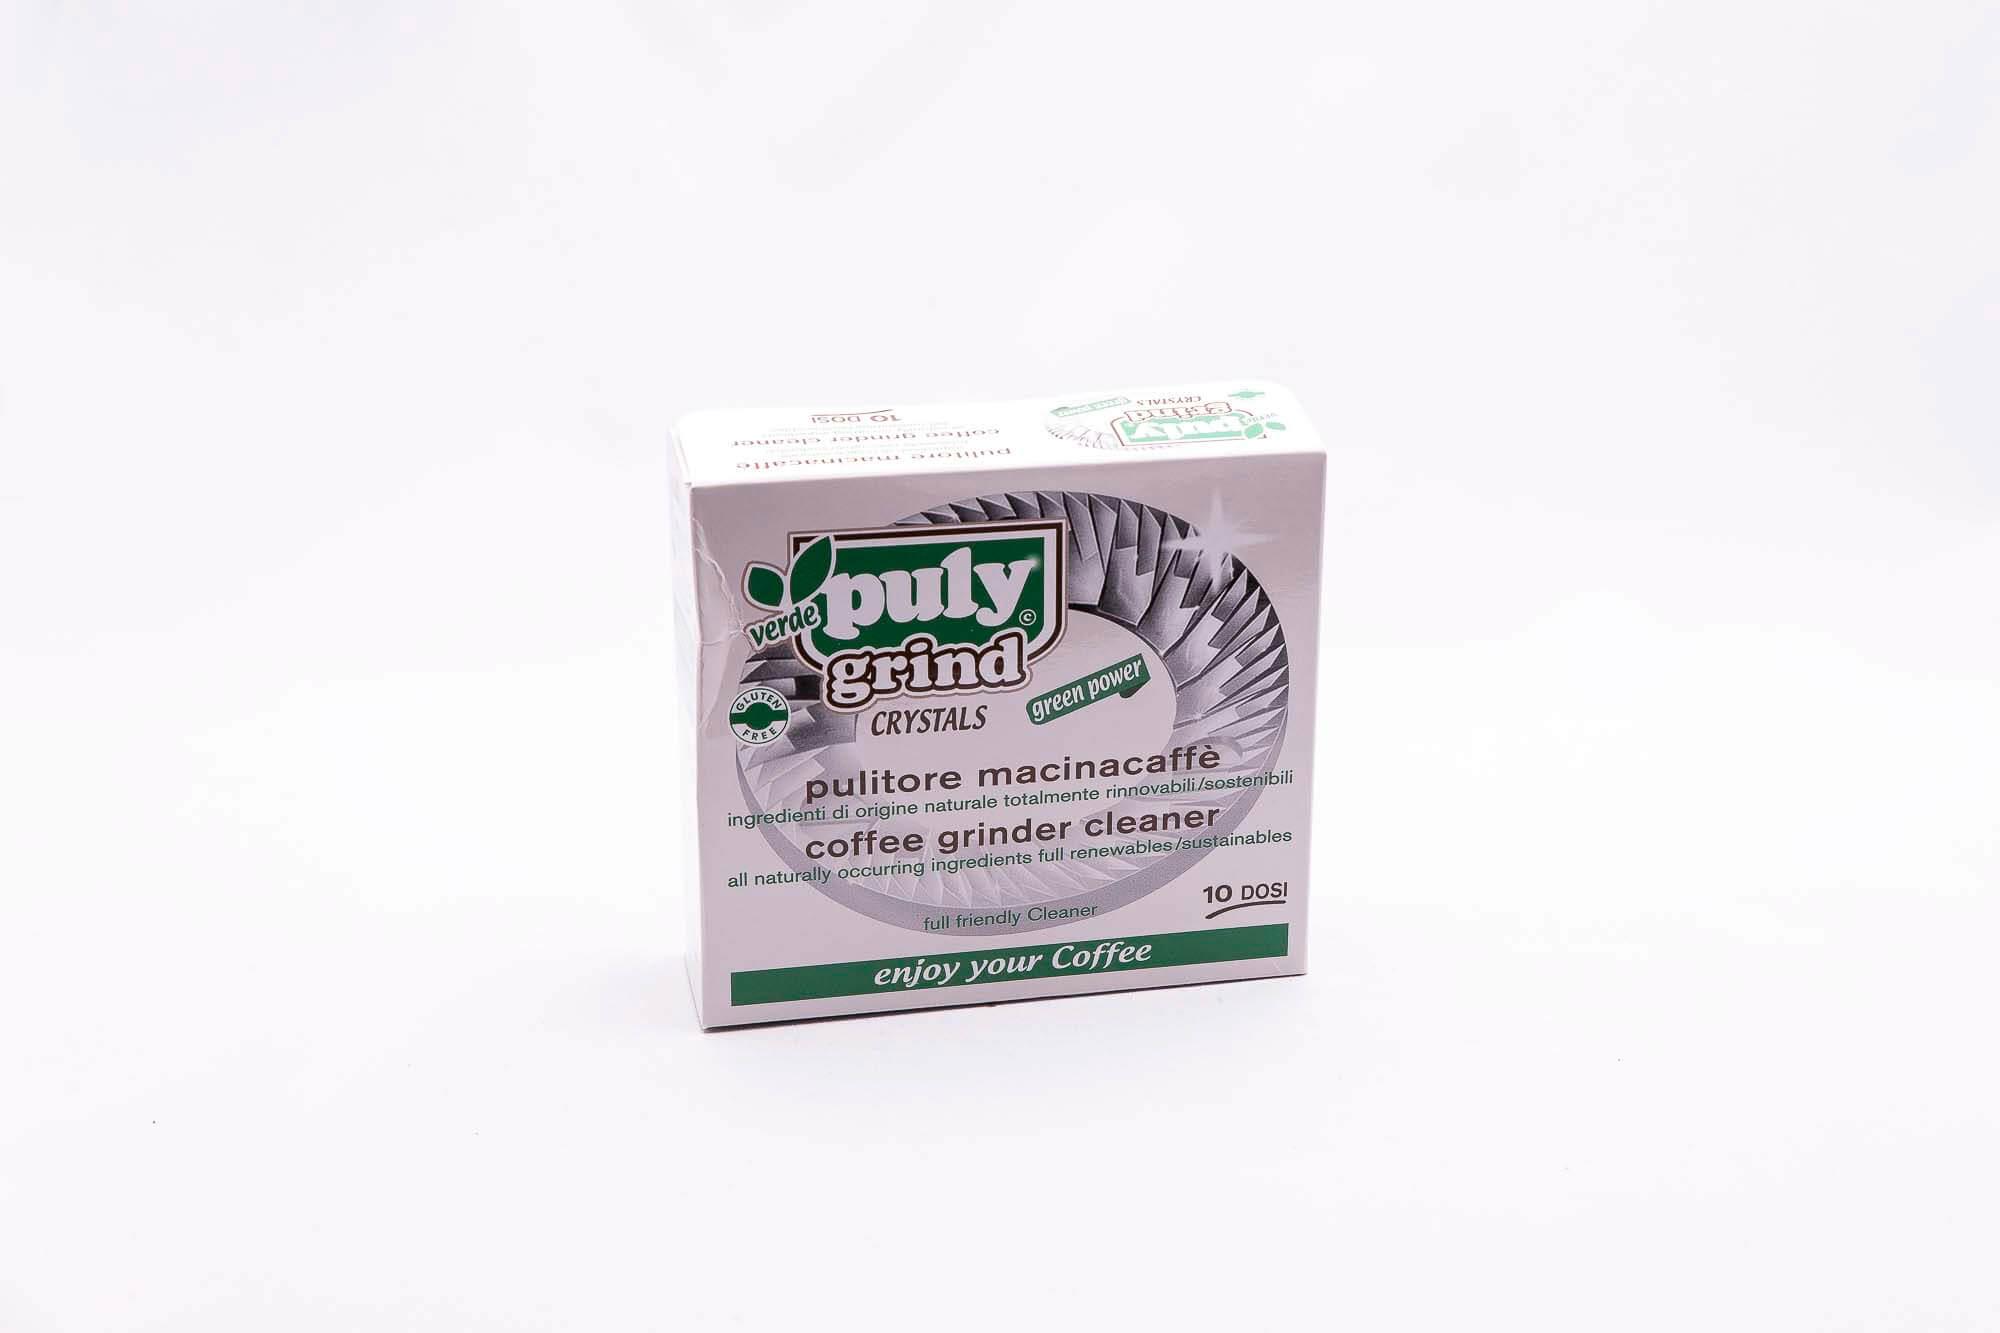 Bonenmaler reiniger (puly grind)